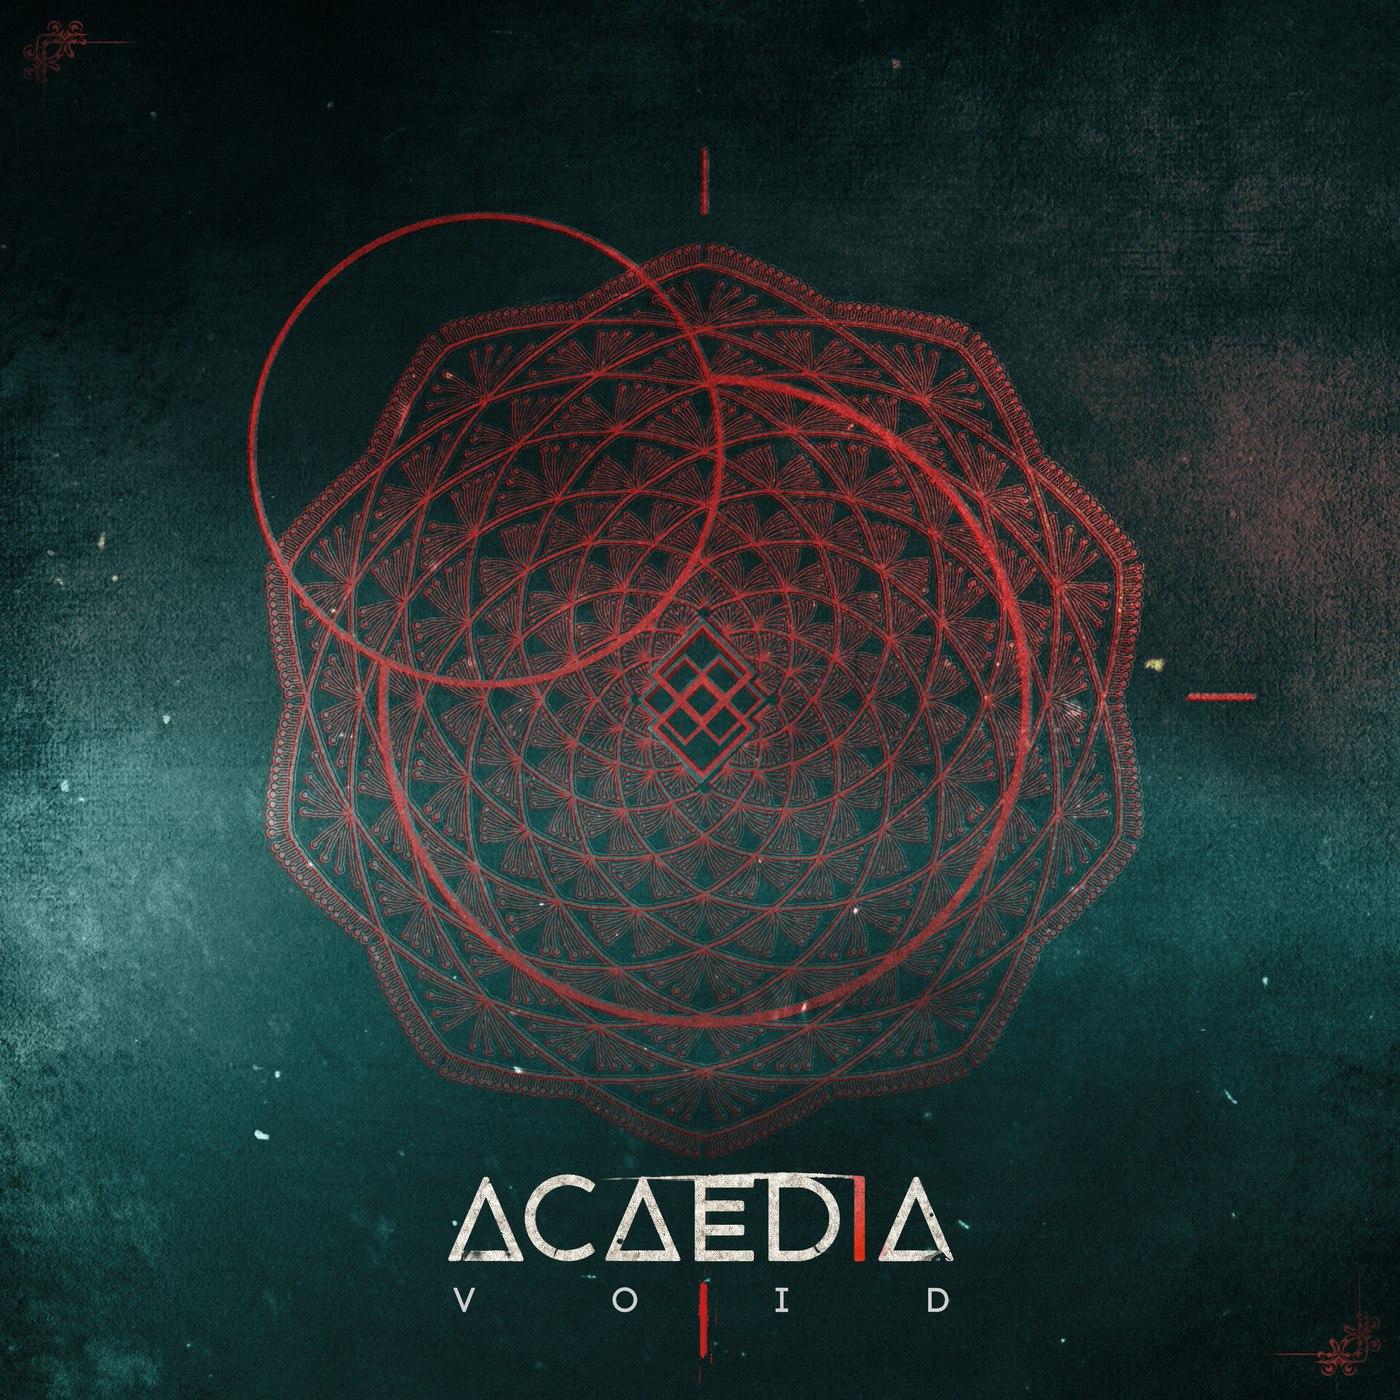 Acaedia - Void [EP] (2017)